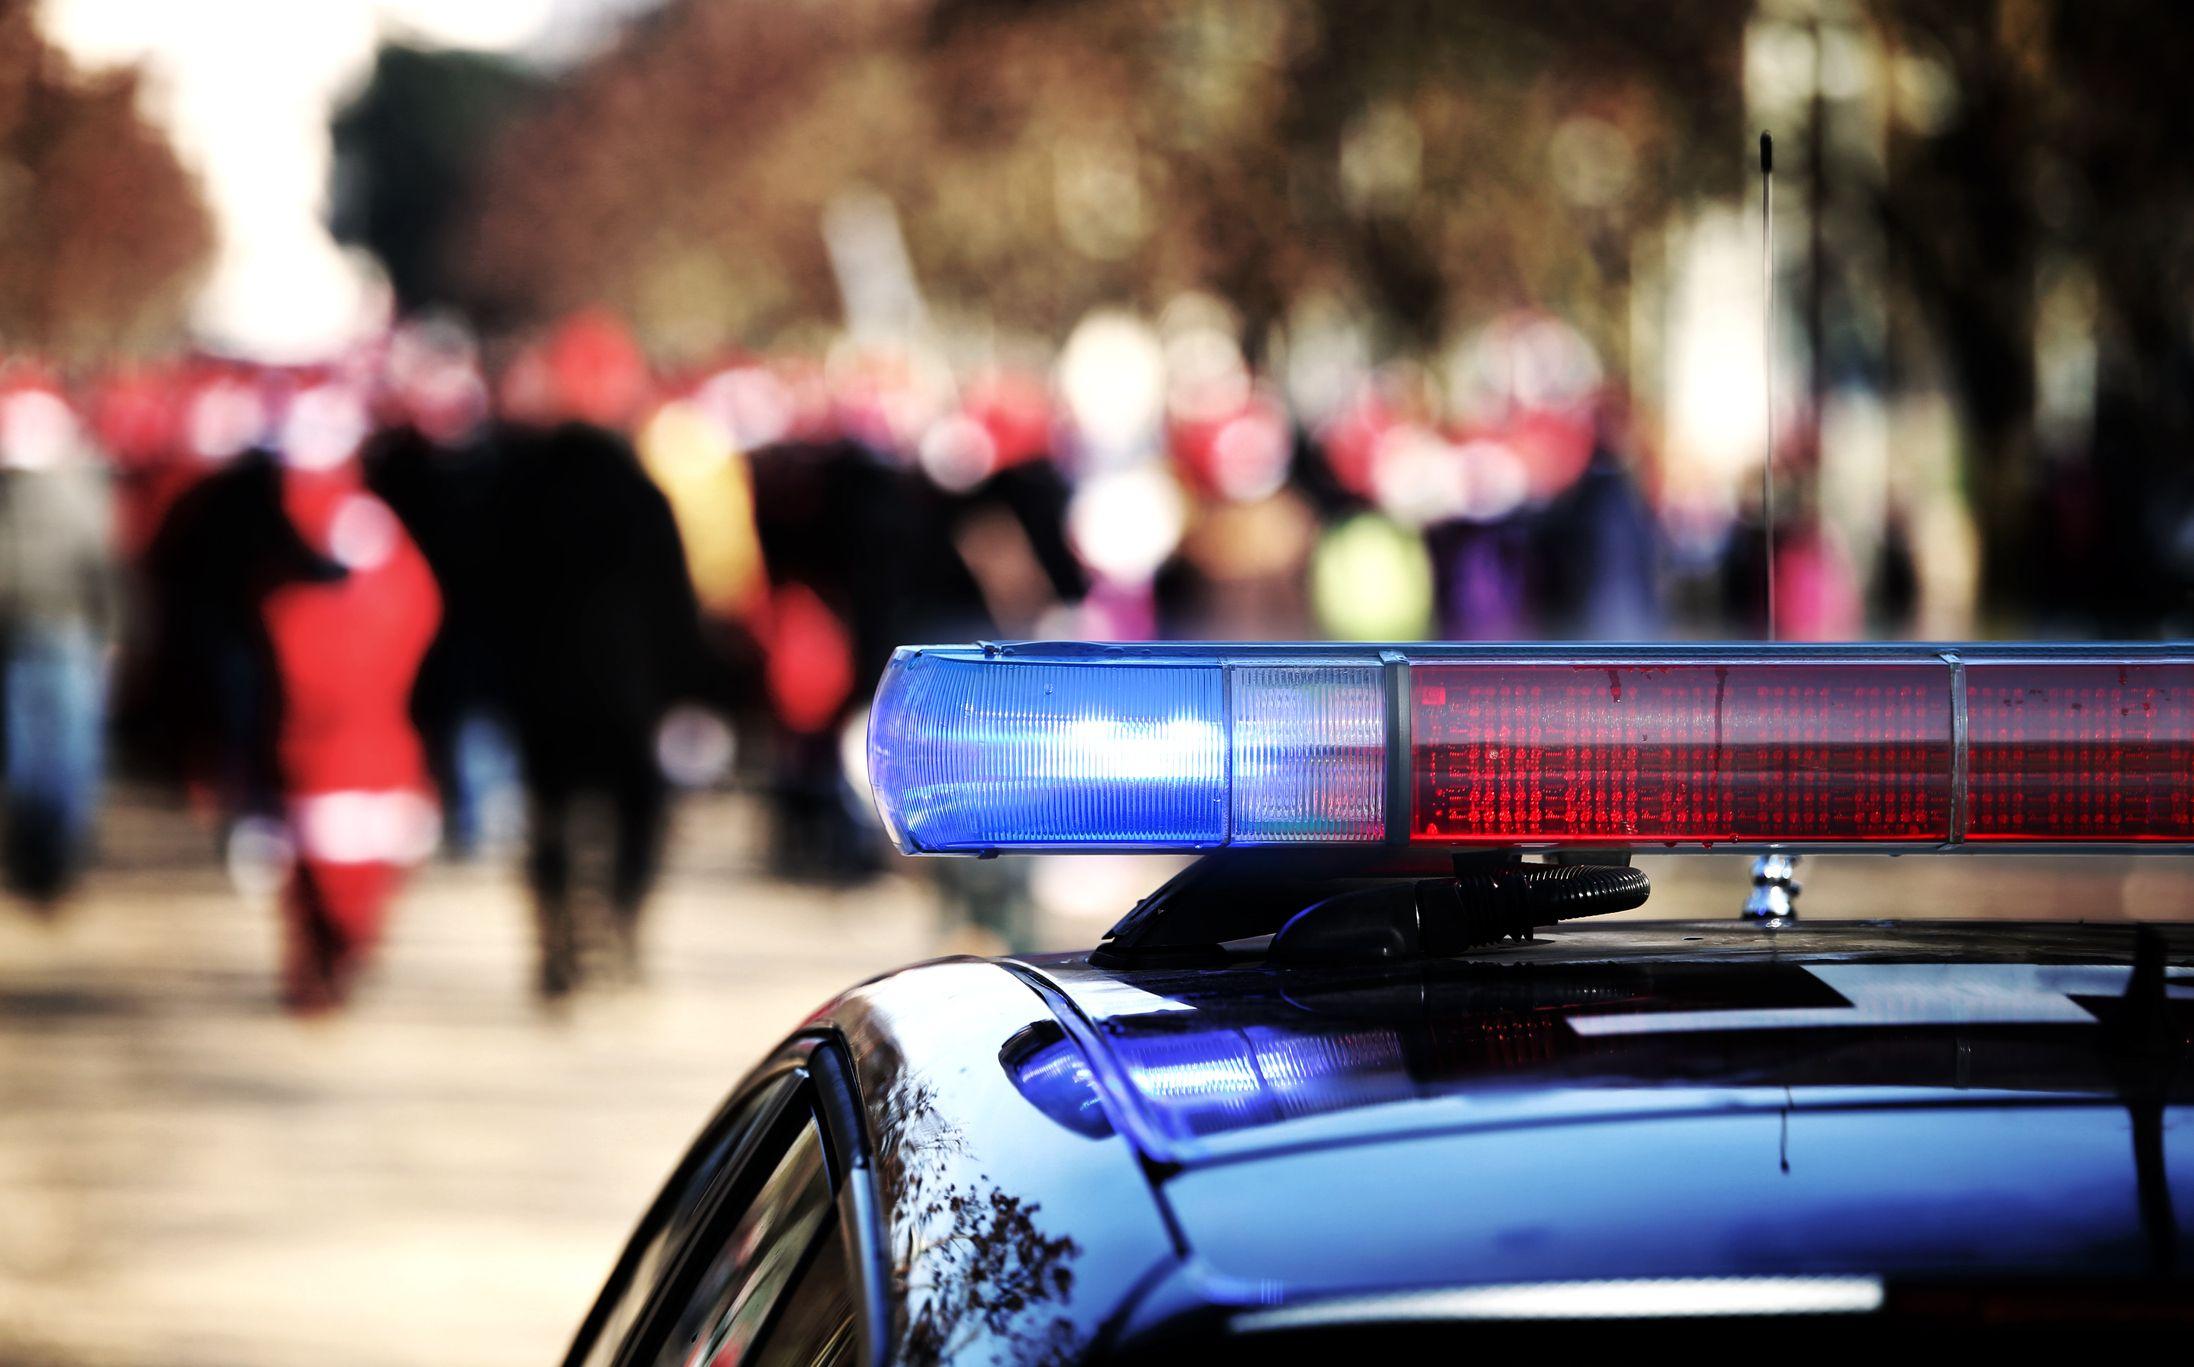 Montana Man Tried to Steal Patrol Car